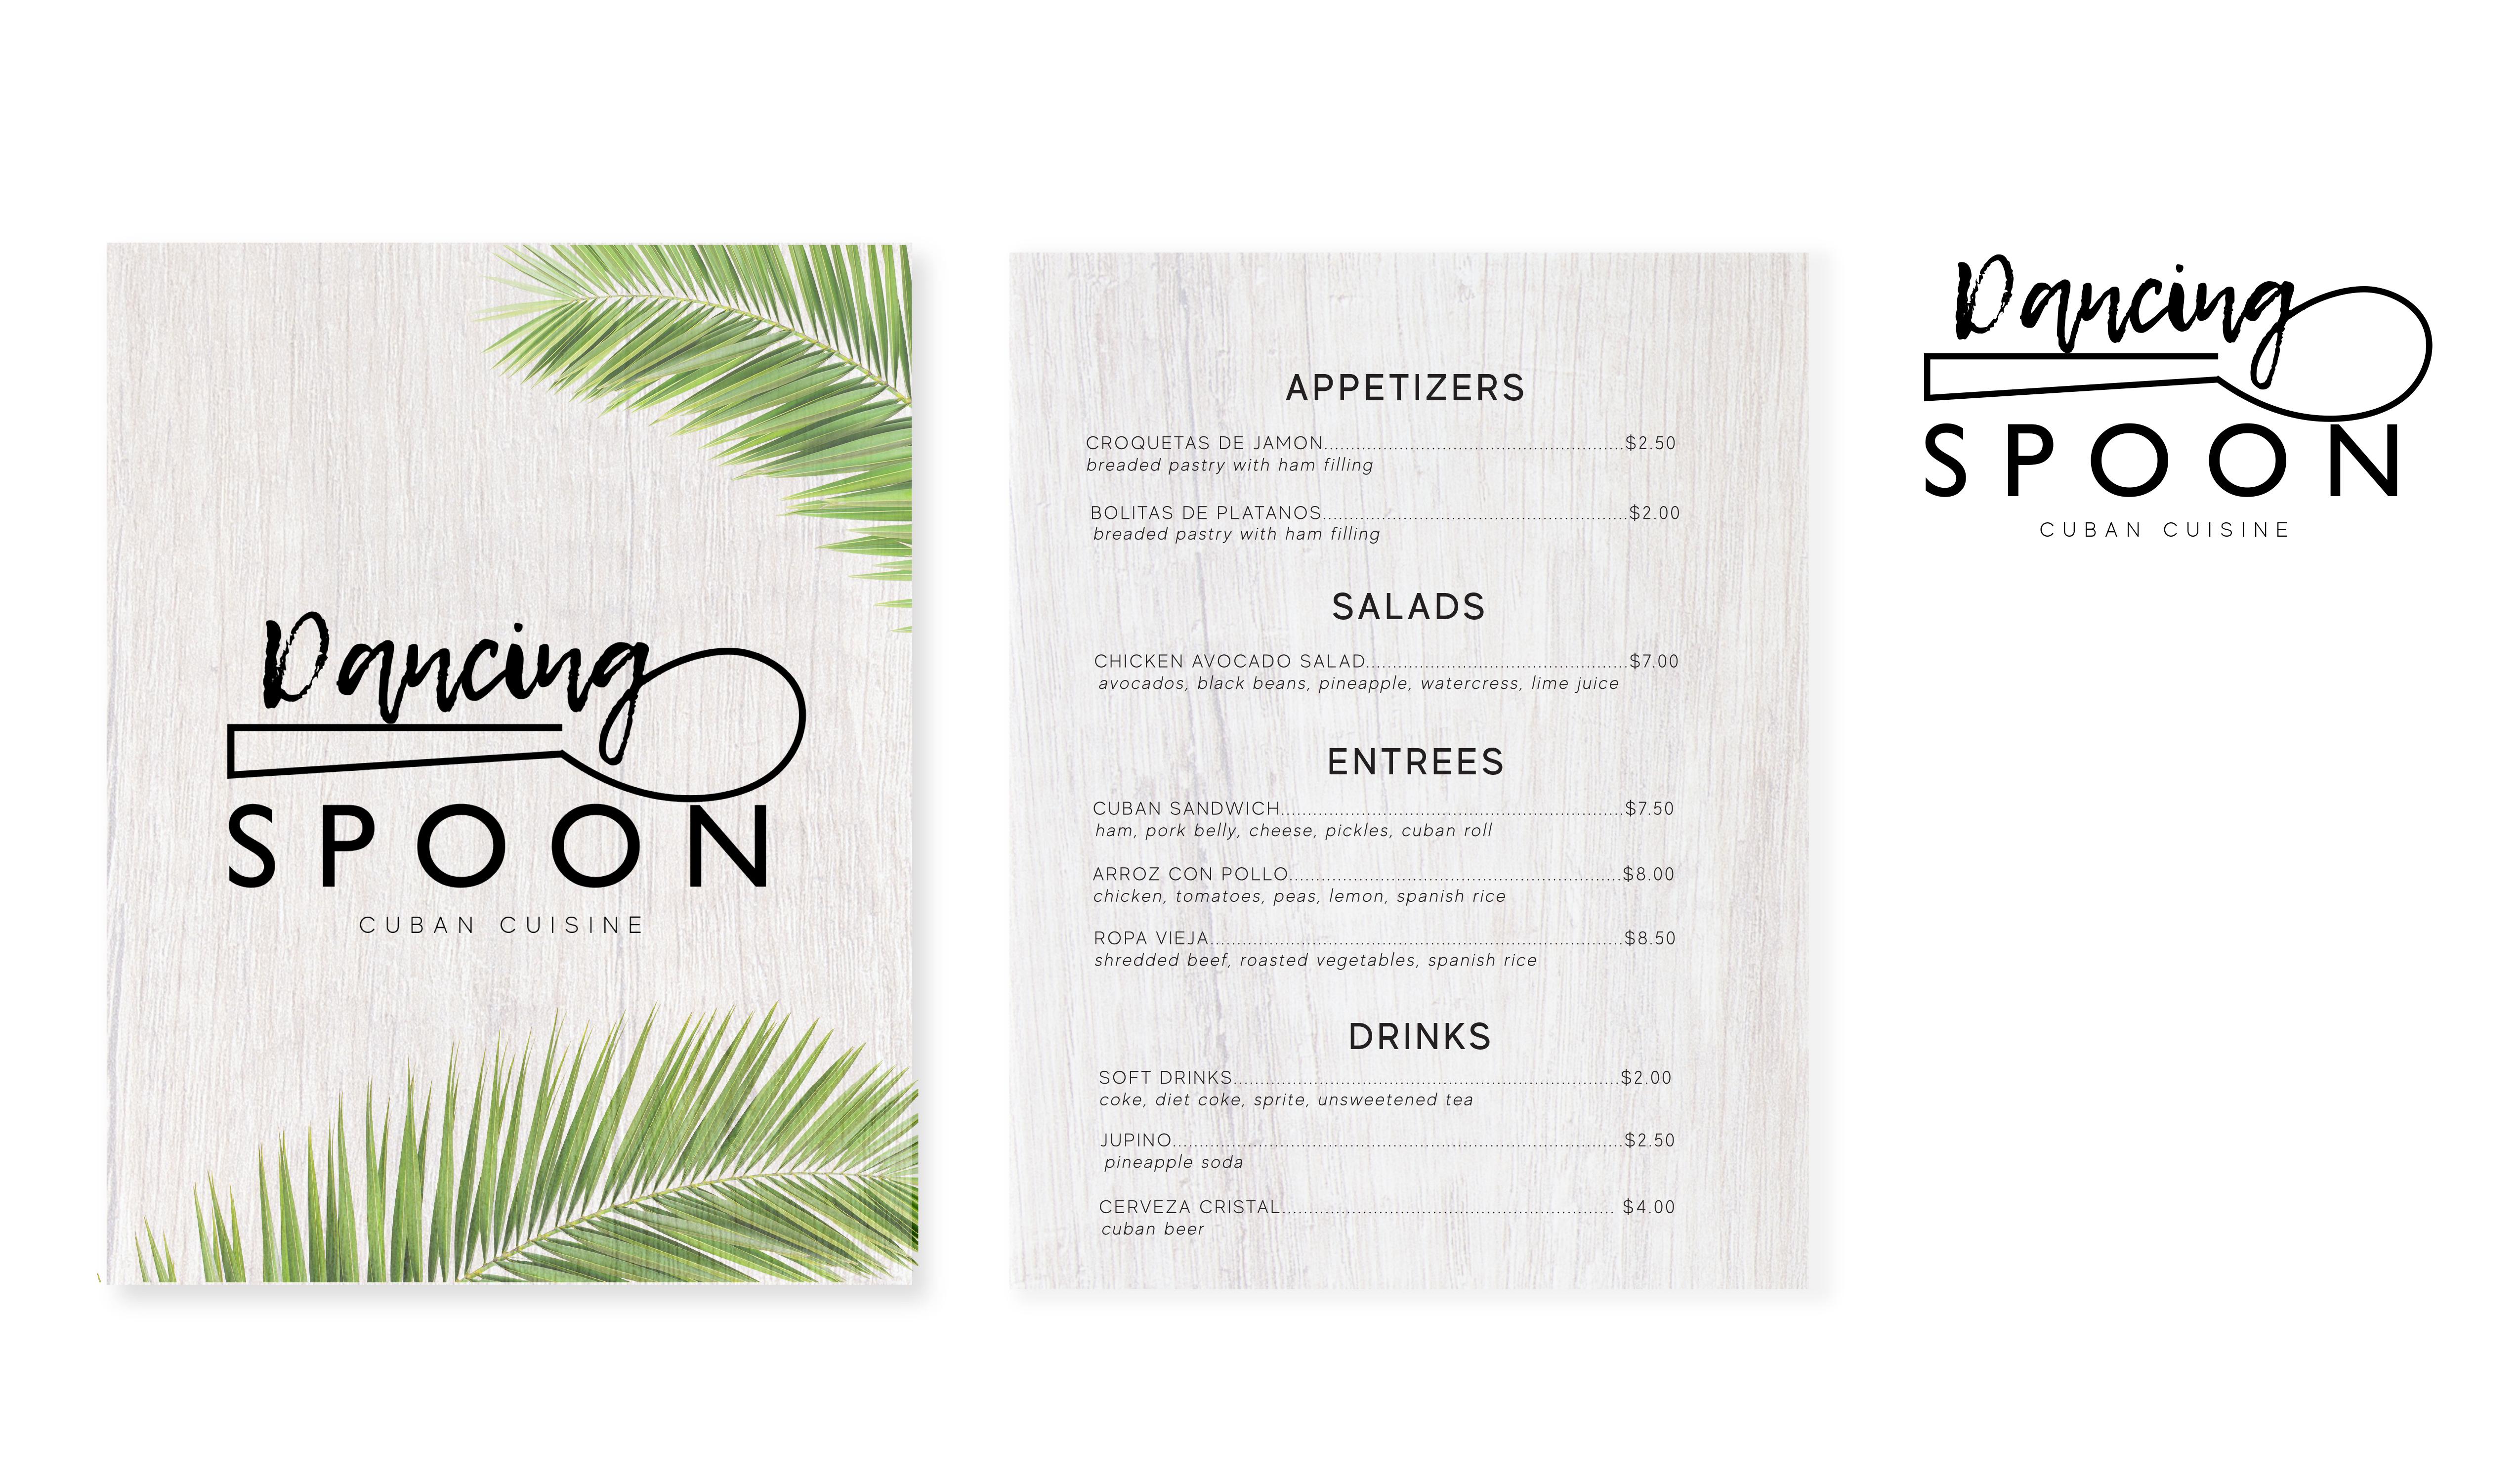 Dancing spoon menu UPDATE portfoliocente